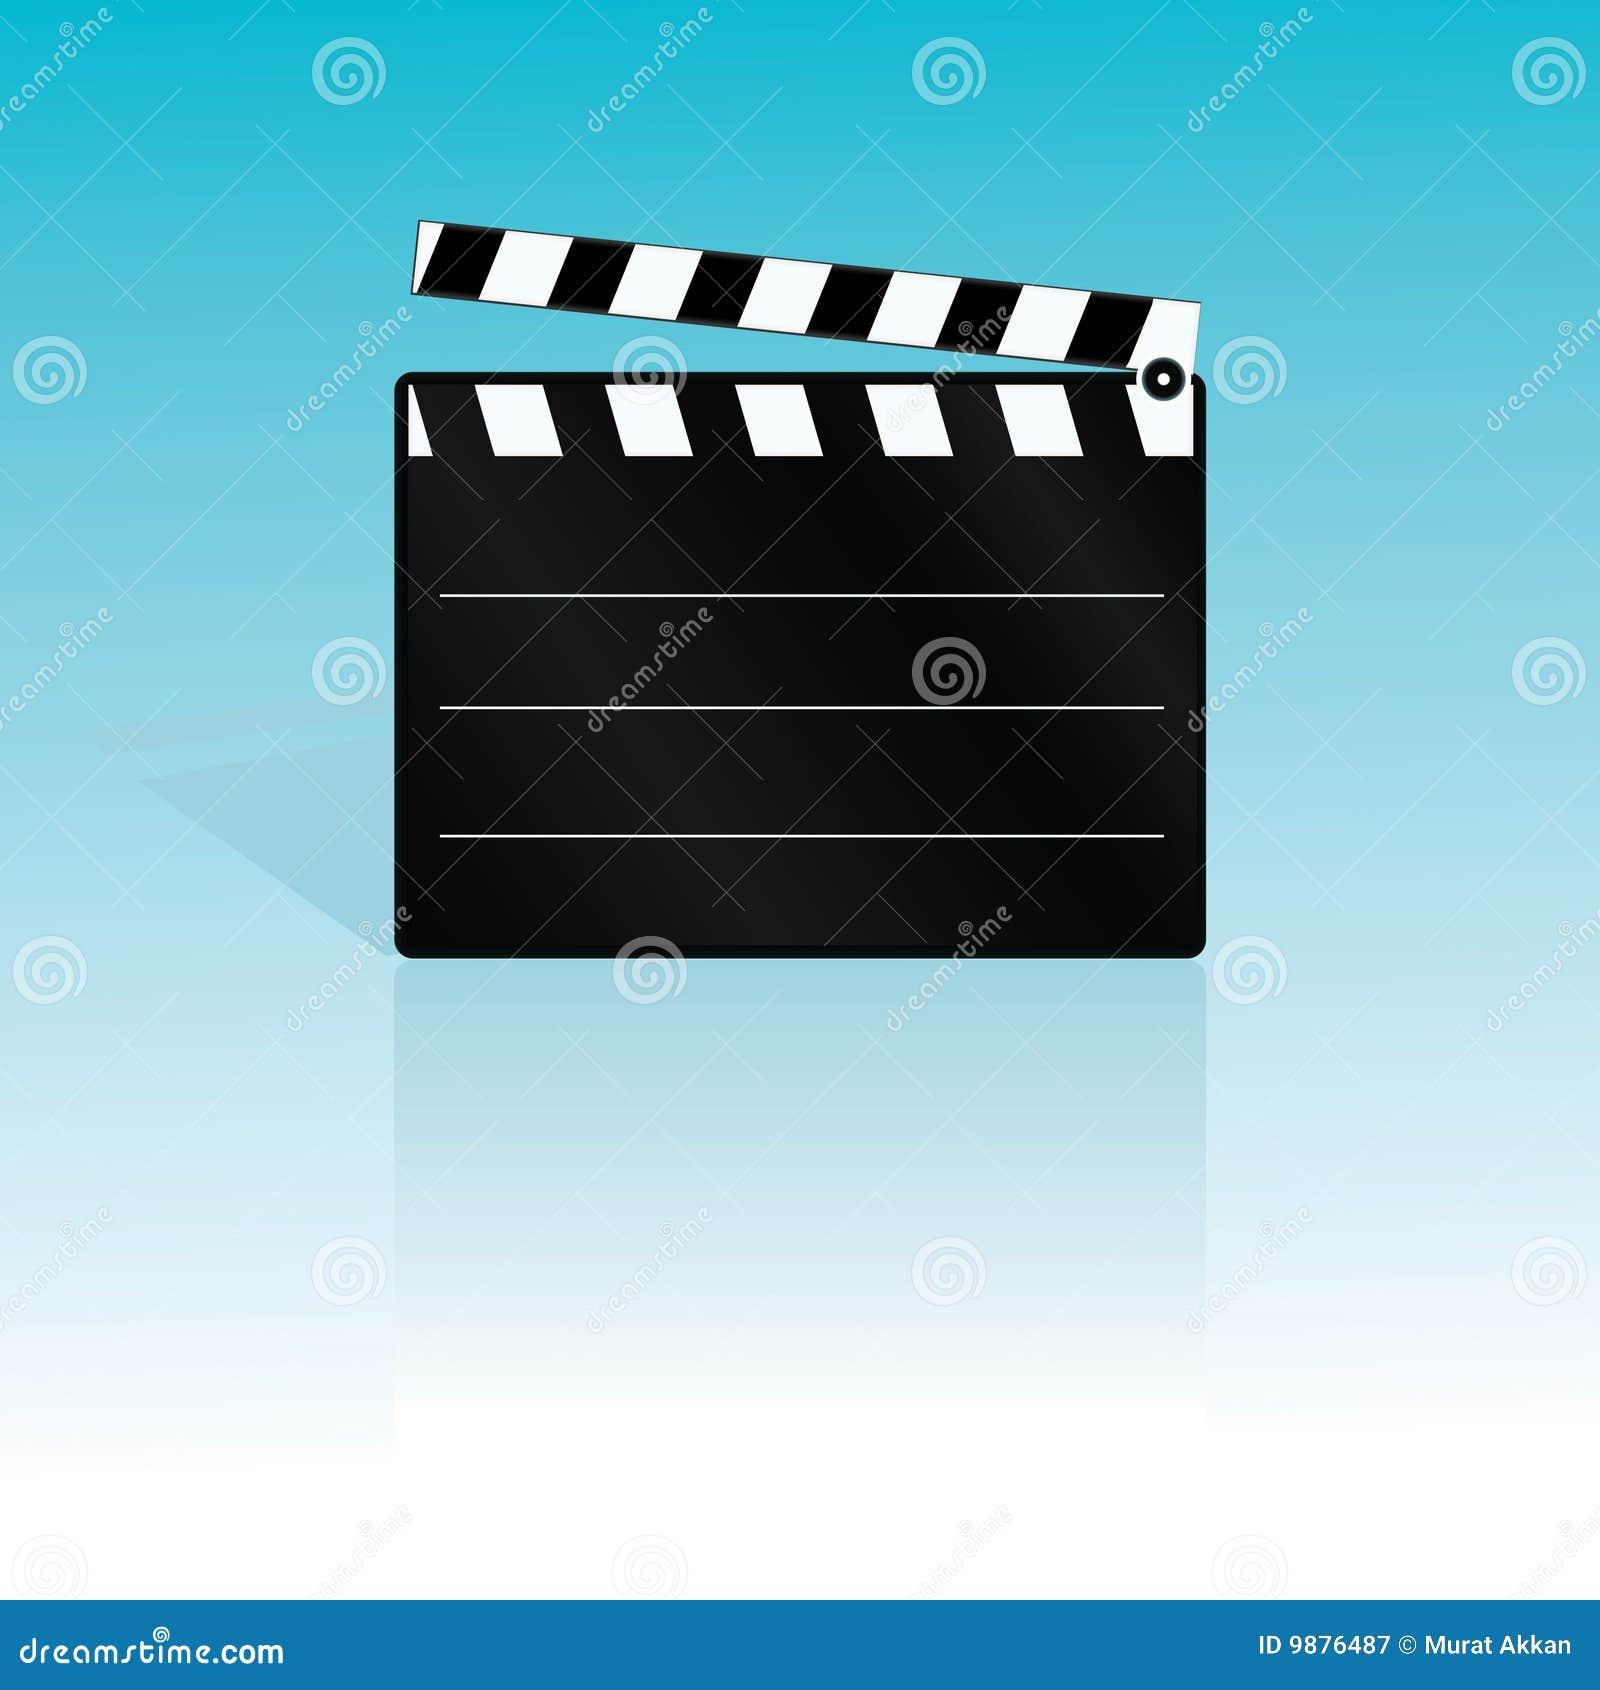 Vector clapboard